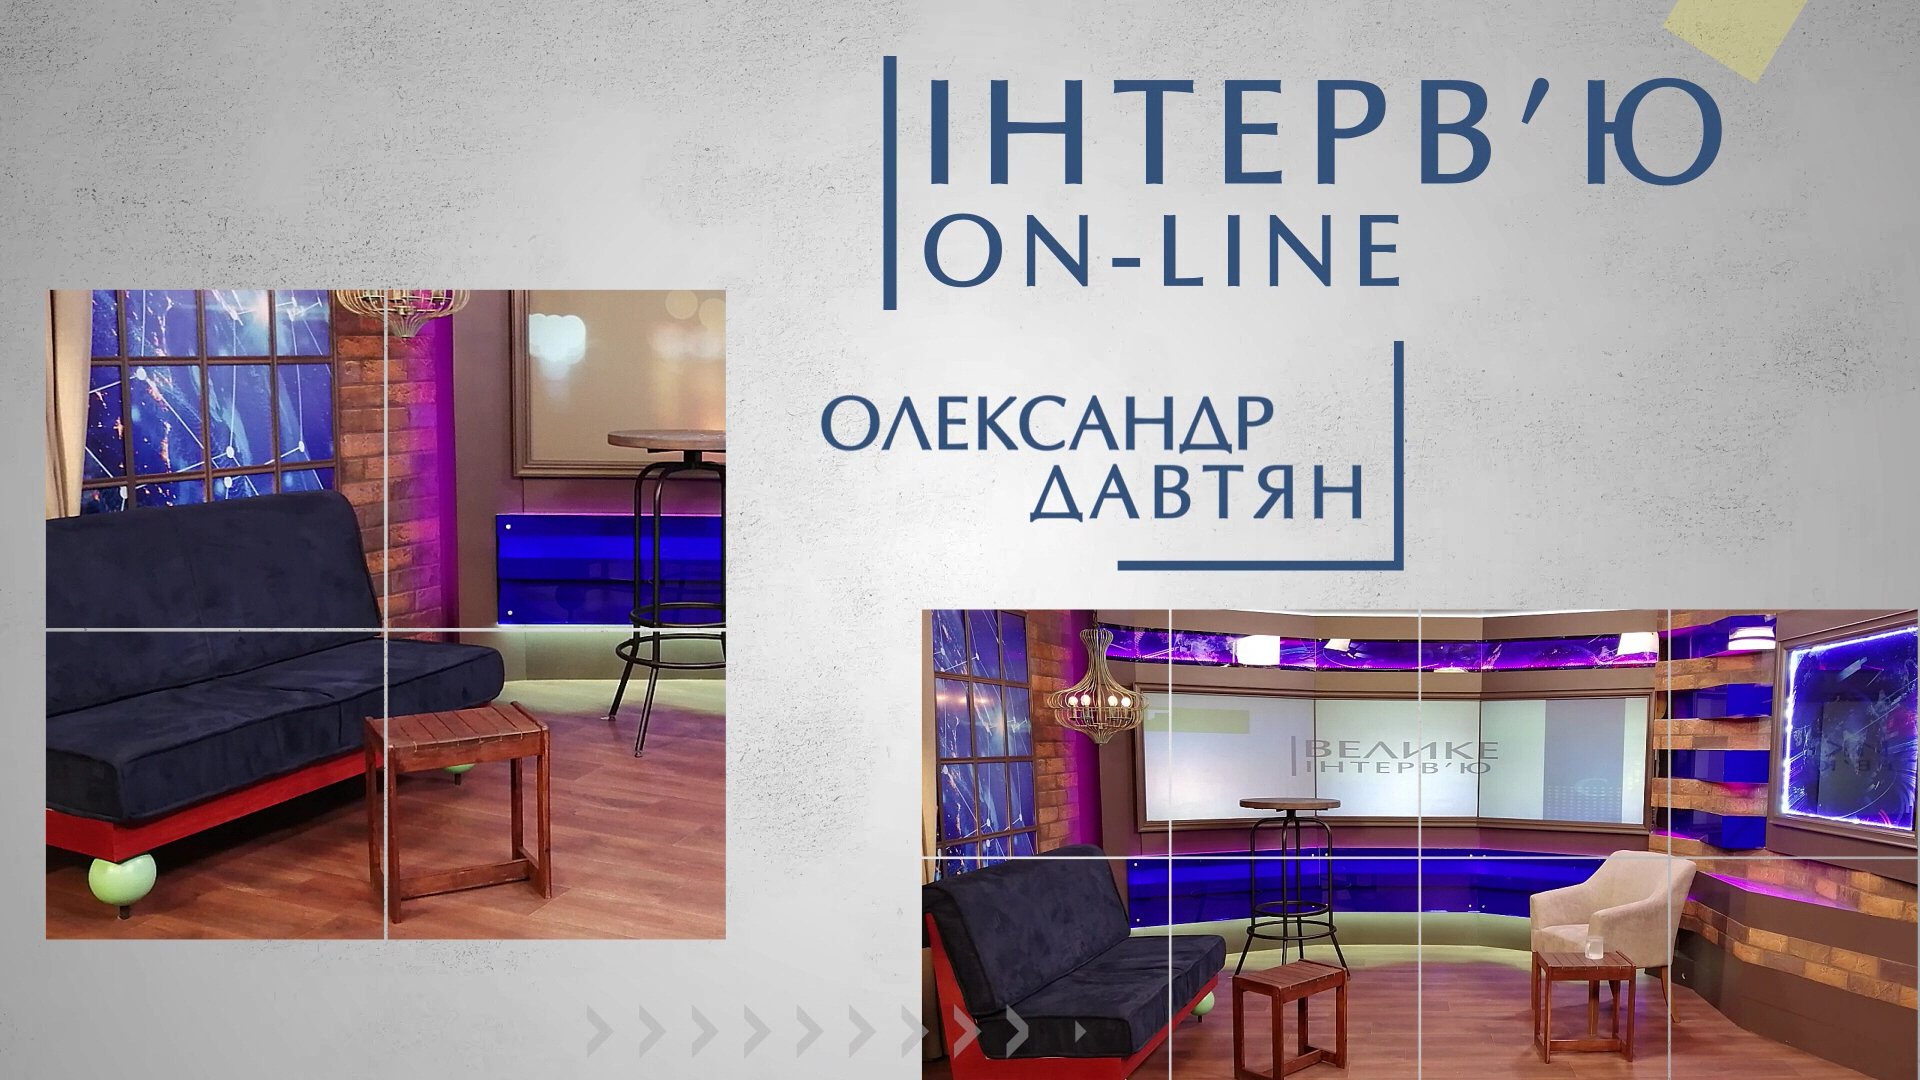 Велике інтерв'ю. Олександр Давтян